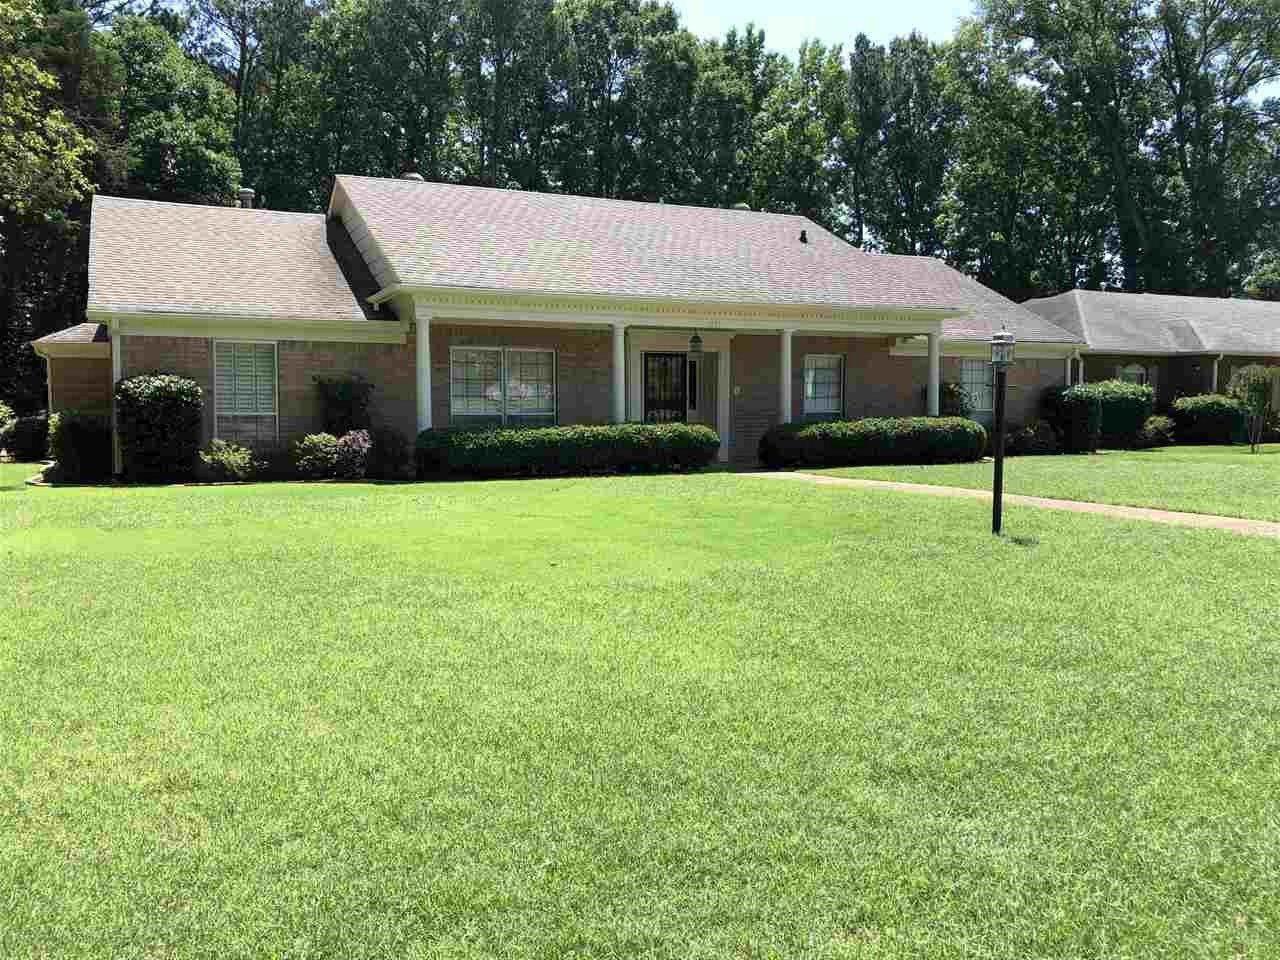 1534 Poplar Estates Pkwy, Germantown, TN 38138 - 4 Bed, 3 Bath  Single-Family Home - MLS #10055391 - 24 Photos | Trulia